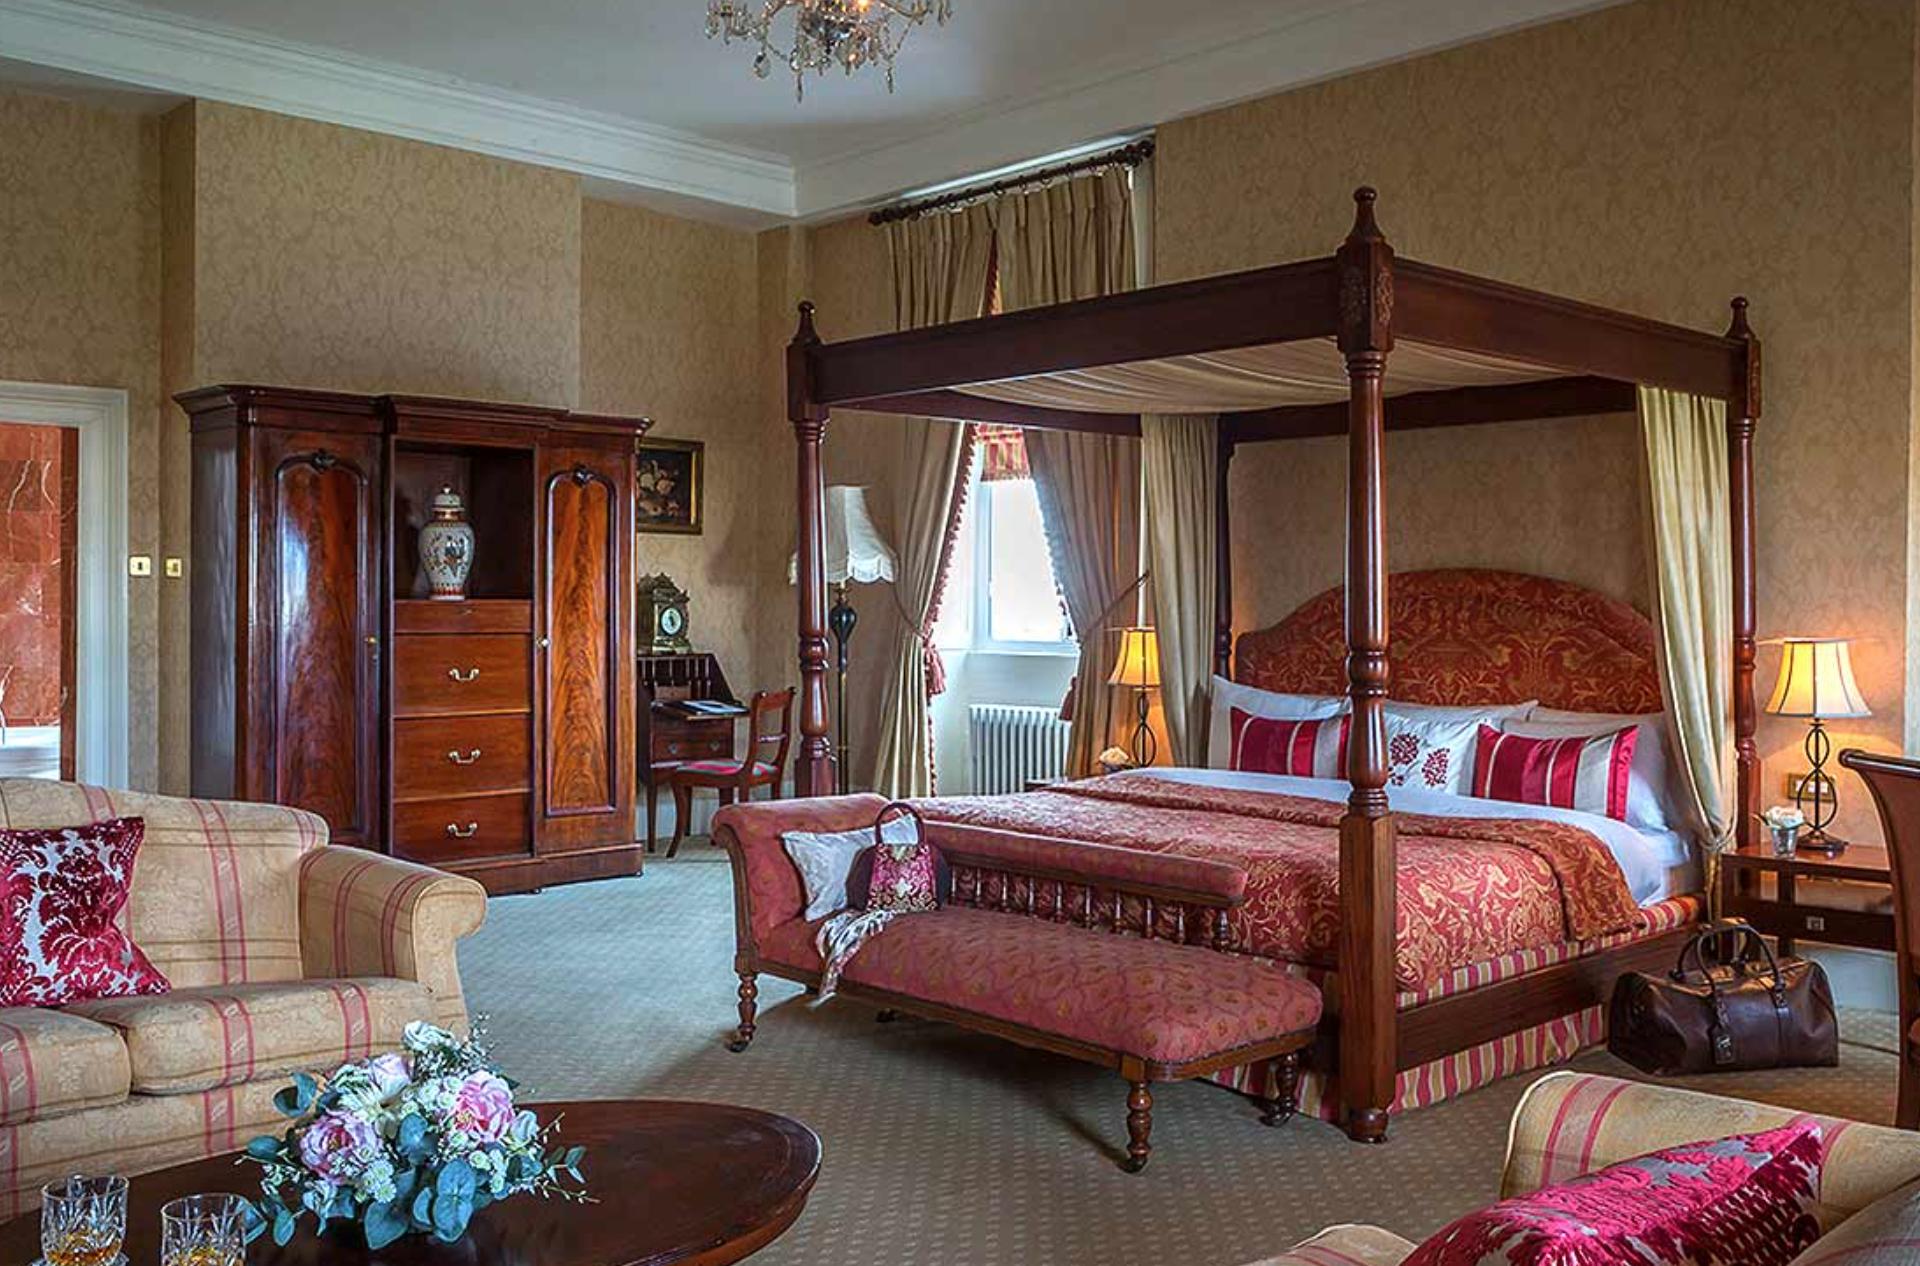 The Hardiman hotel in Galway, Ireland